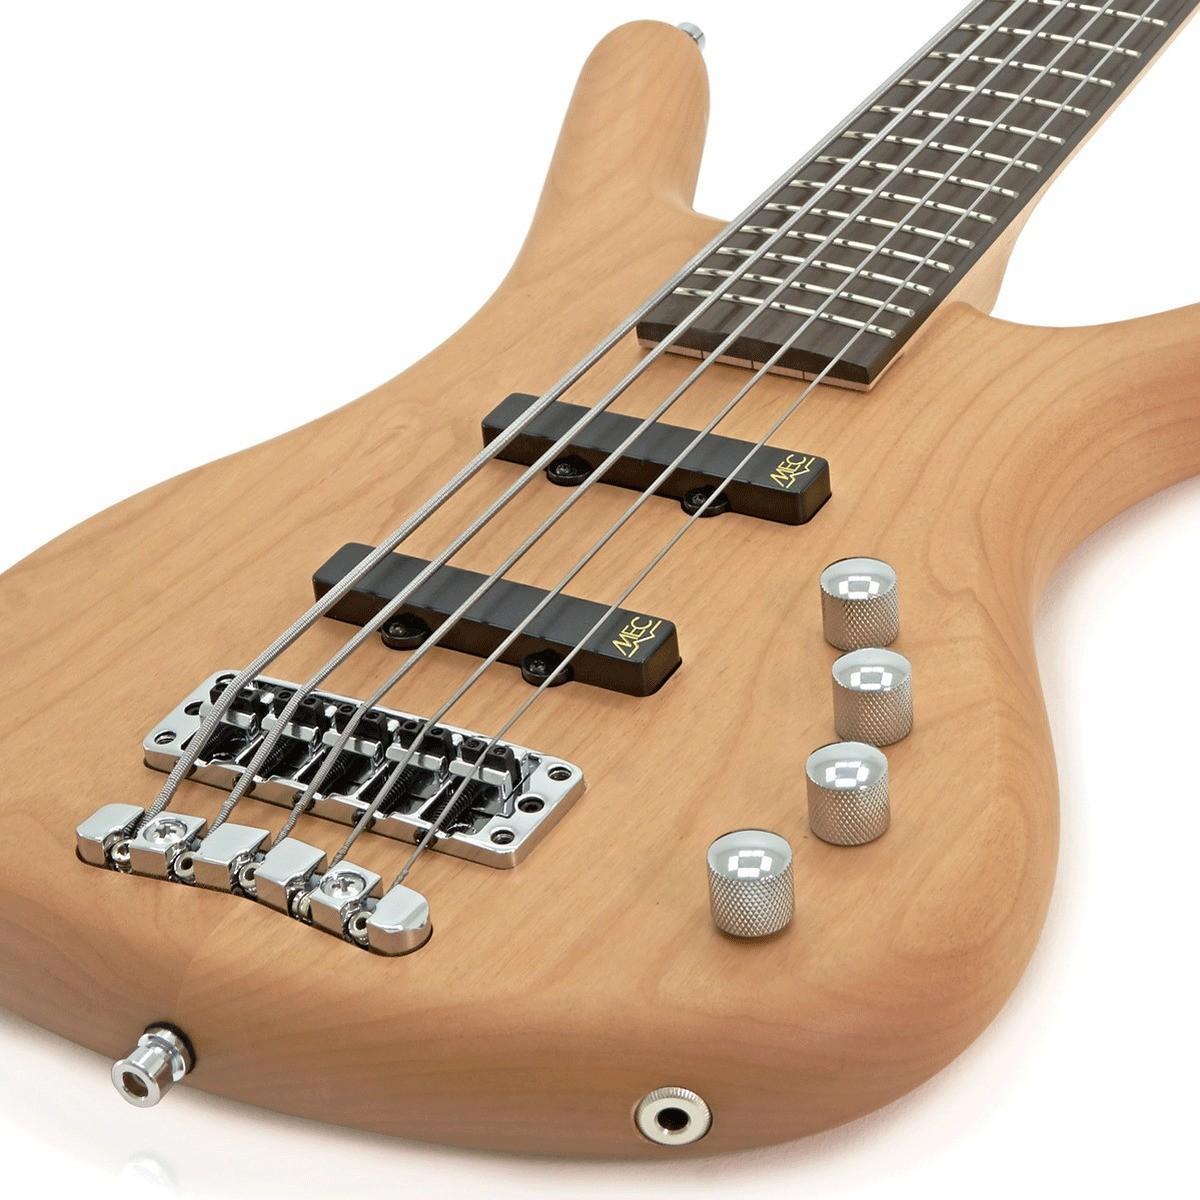 Warwick 5 String Bass : warwick rockbass corvette basic 5 string bass medium natural satin at ~ Vivirlamusica.com Haus und Dekorationen